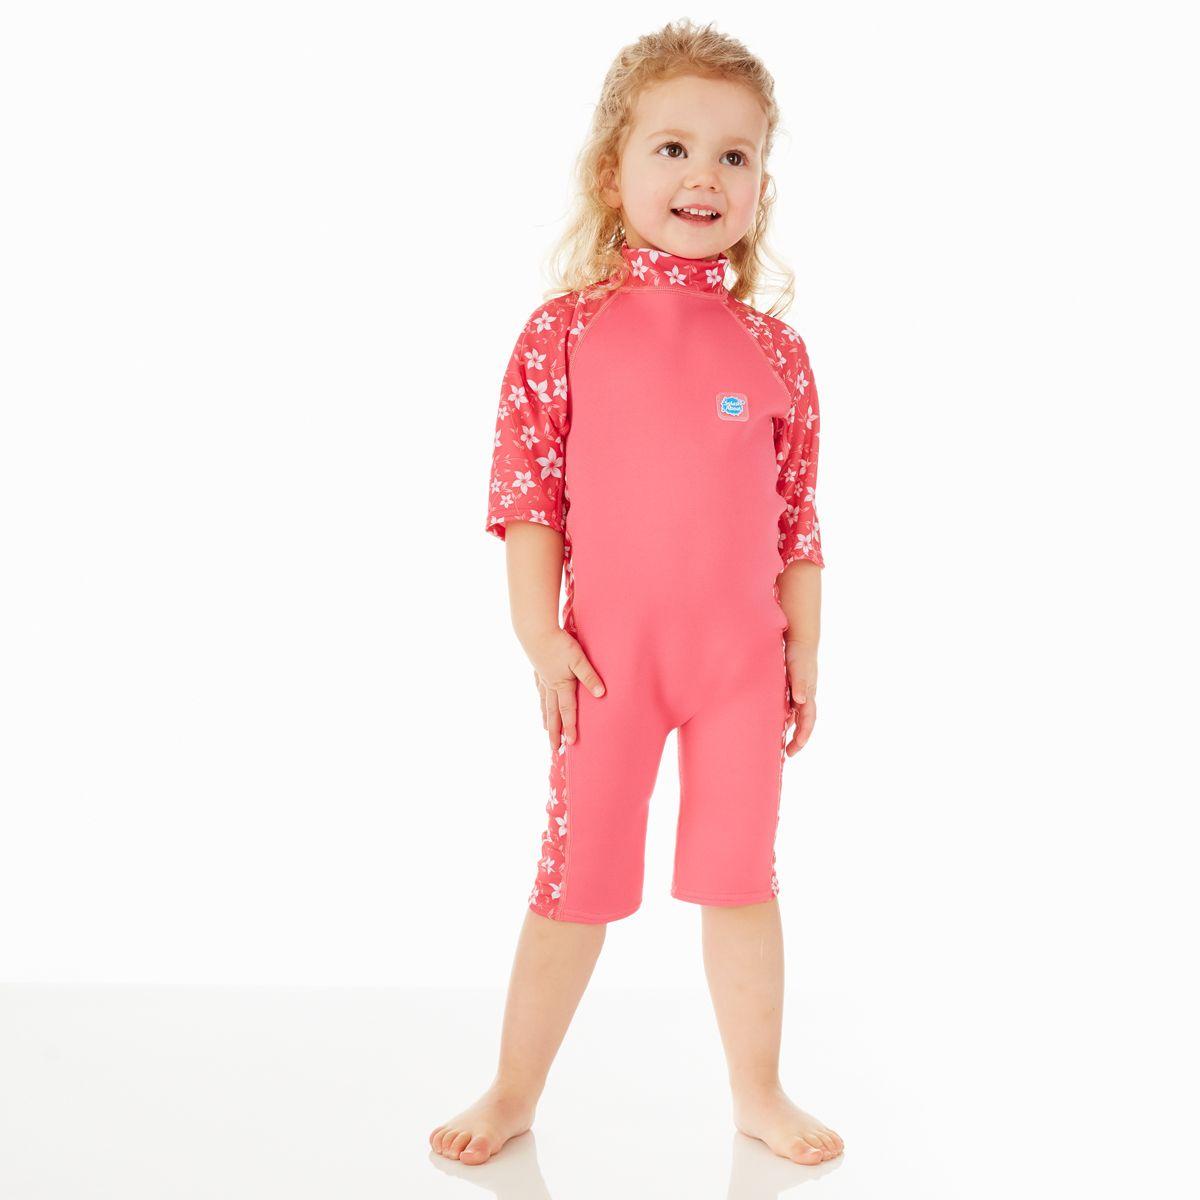 7a75ac9f03 UV Sun & Sea Wetsuit Pink Blossom  Kids Beachwear Wetsuit